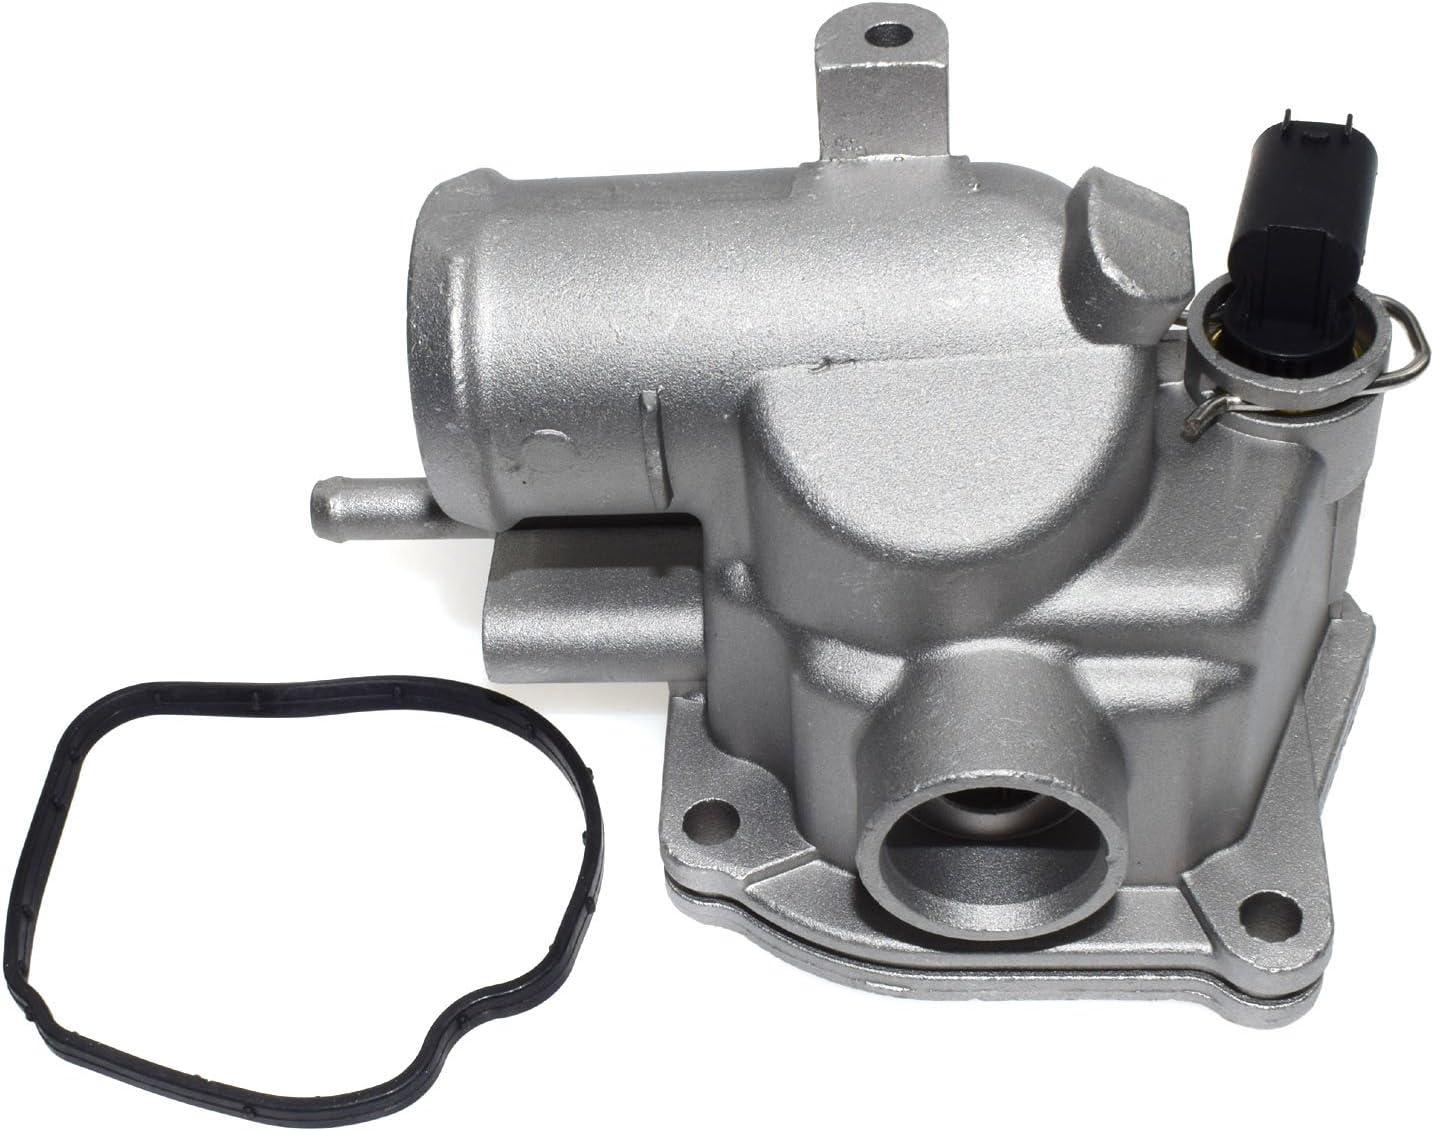 Neue Motor K/ühlmittel Thermostat 6112000515/F/ür Benzs S-Klasse Limo W210/S210/E200/E220/e270t 1998/1999/2000/2001/2002/2003